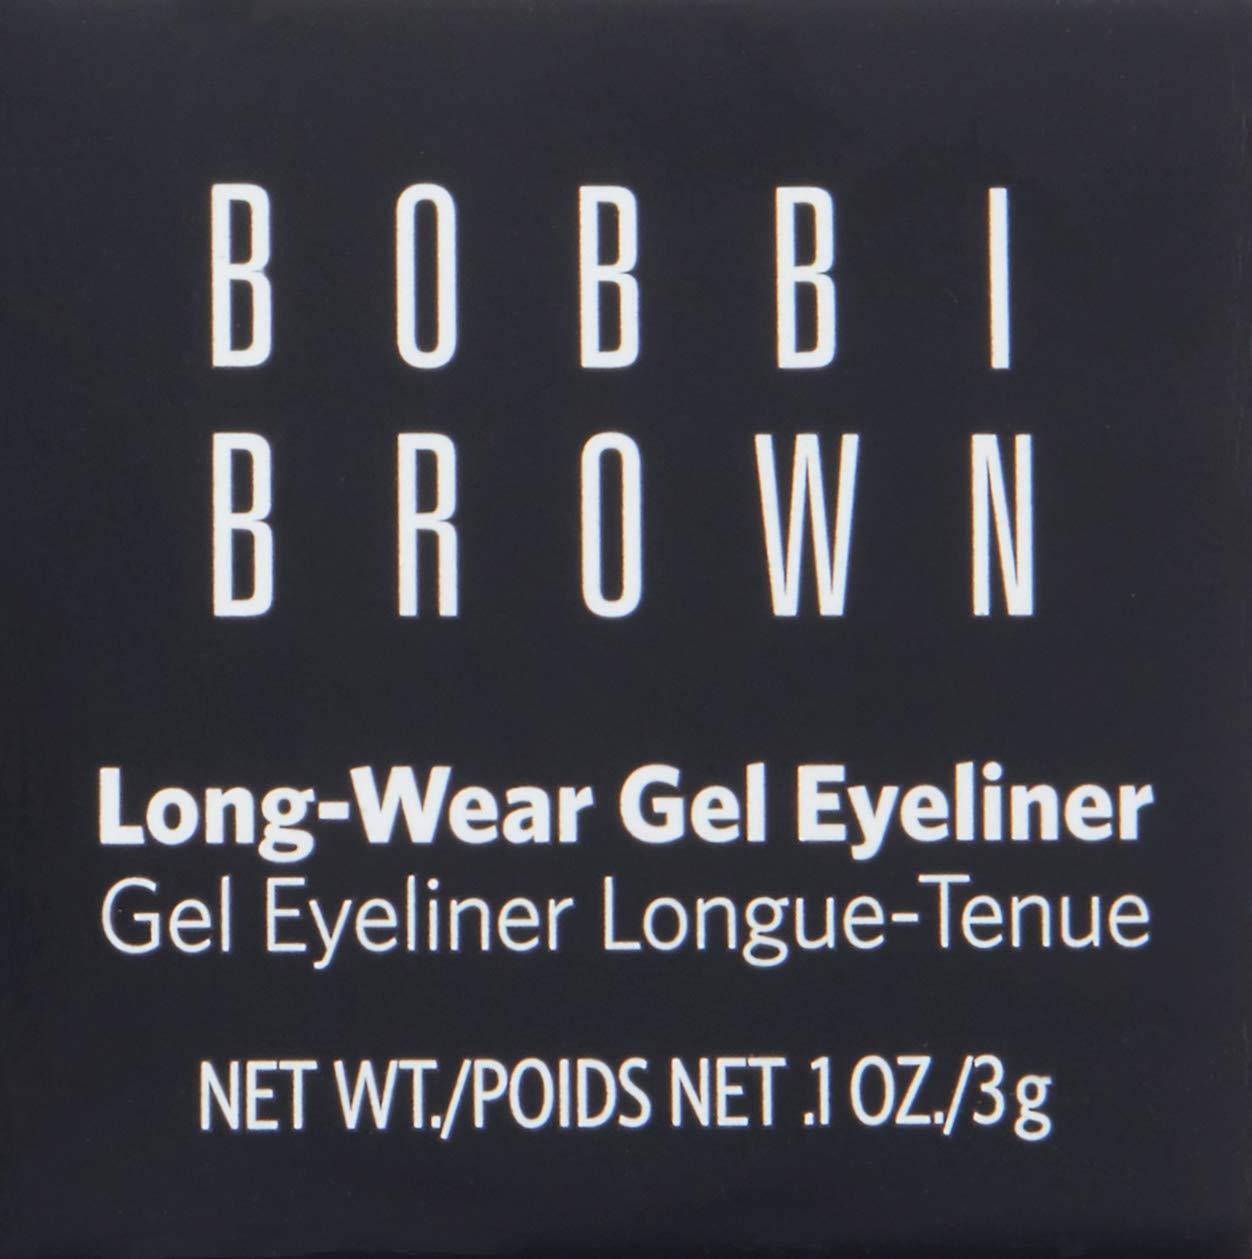 Bobbi Brown Long Wear Gel Eyeliner, No. 03 Cobalt Ink, 0.1 Ounce by Bobbi Brown (Image #3)